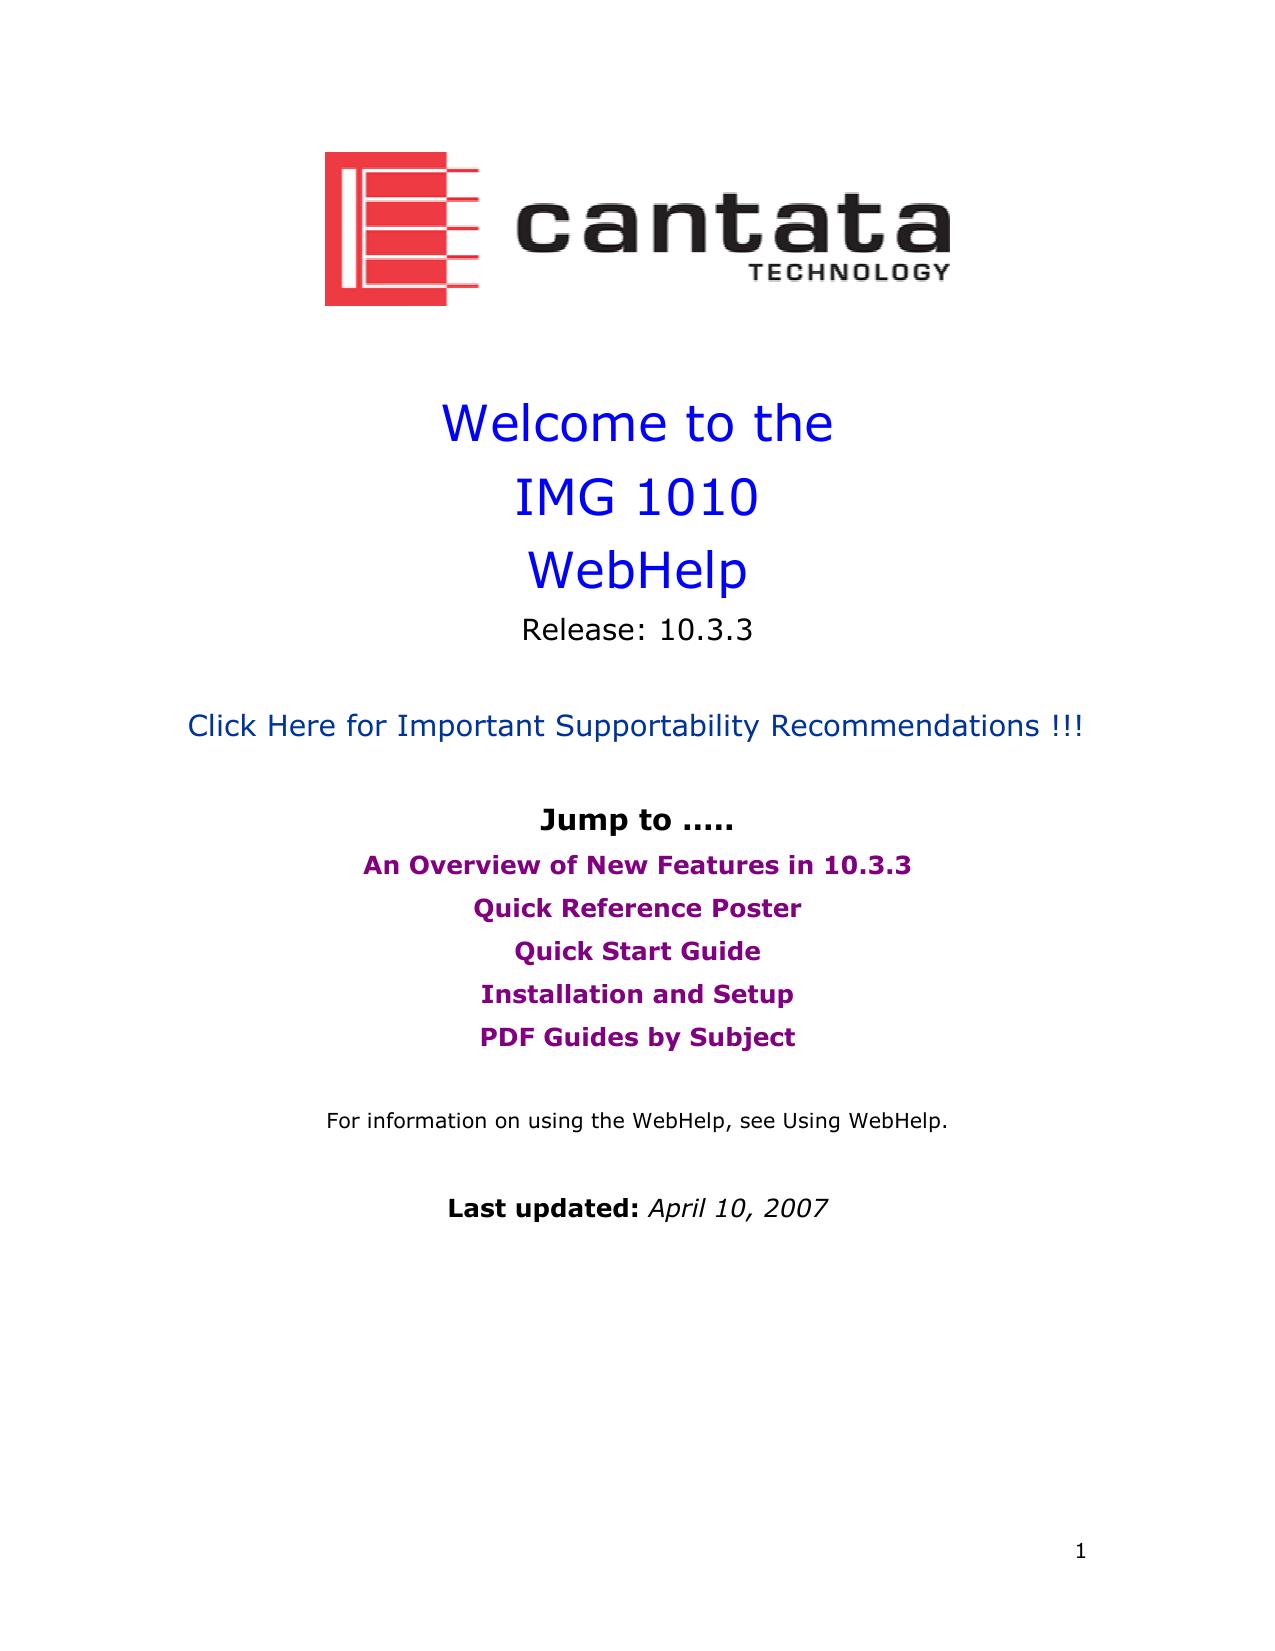 Welcome to the IMG 1010 WebHelp | manualzz com